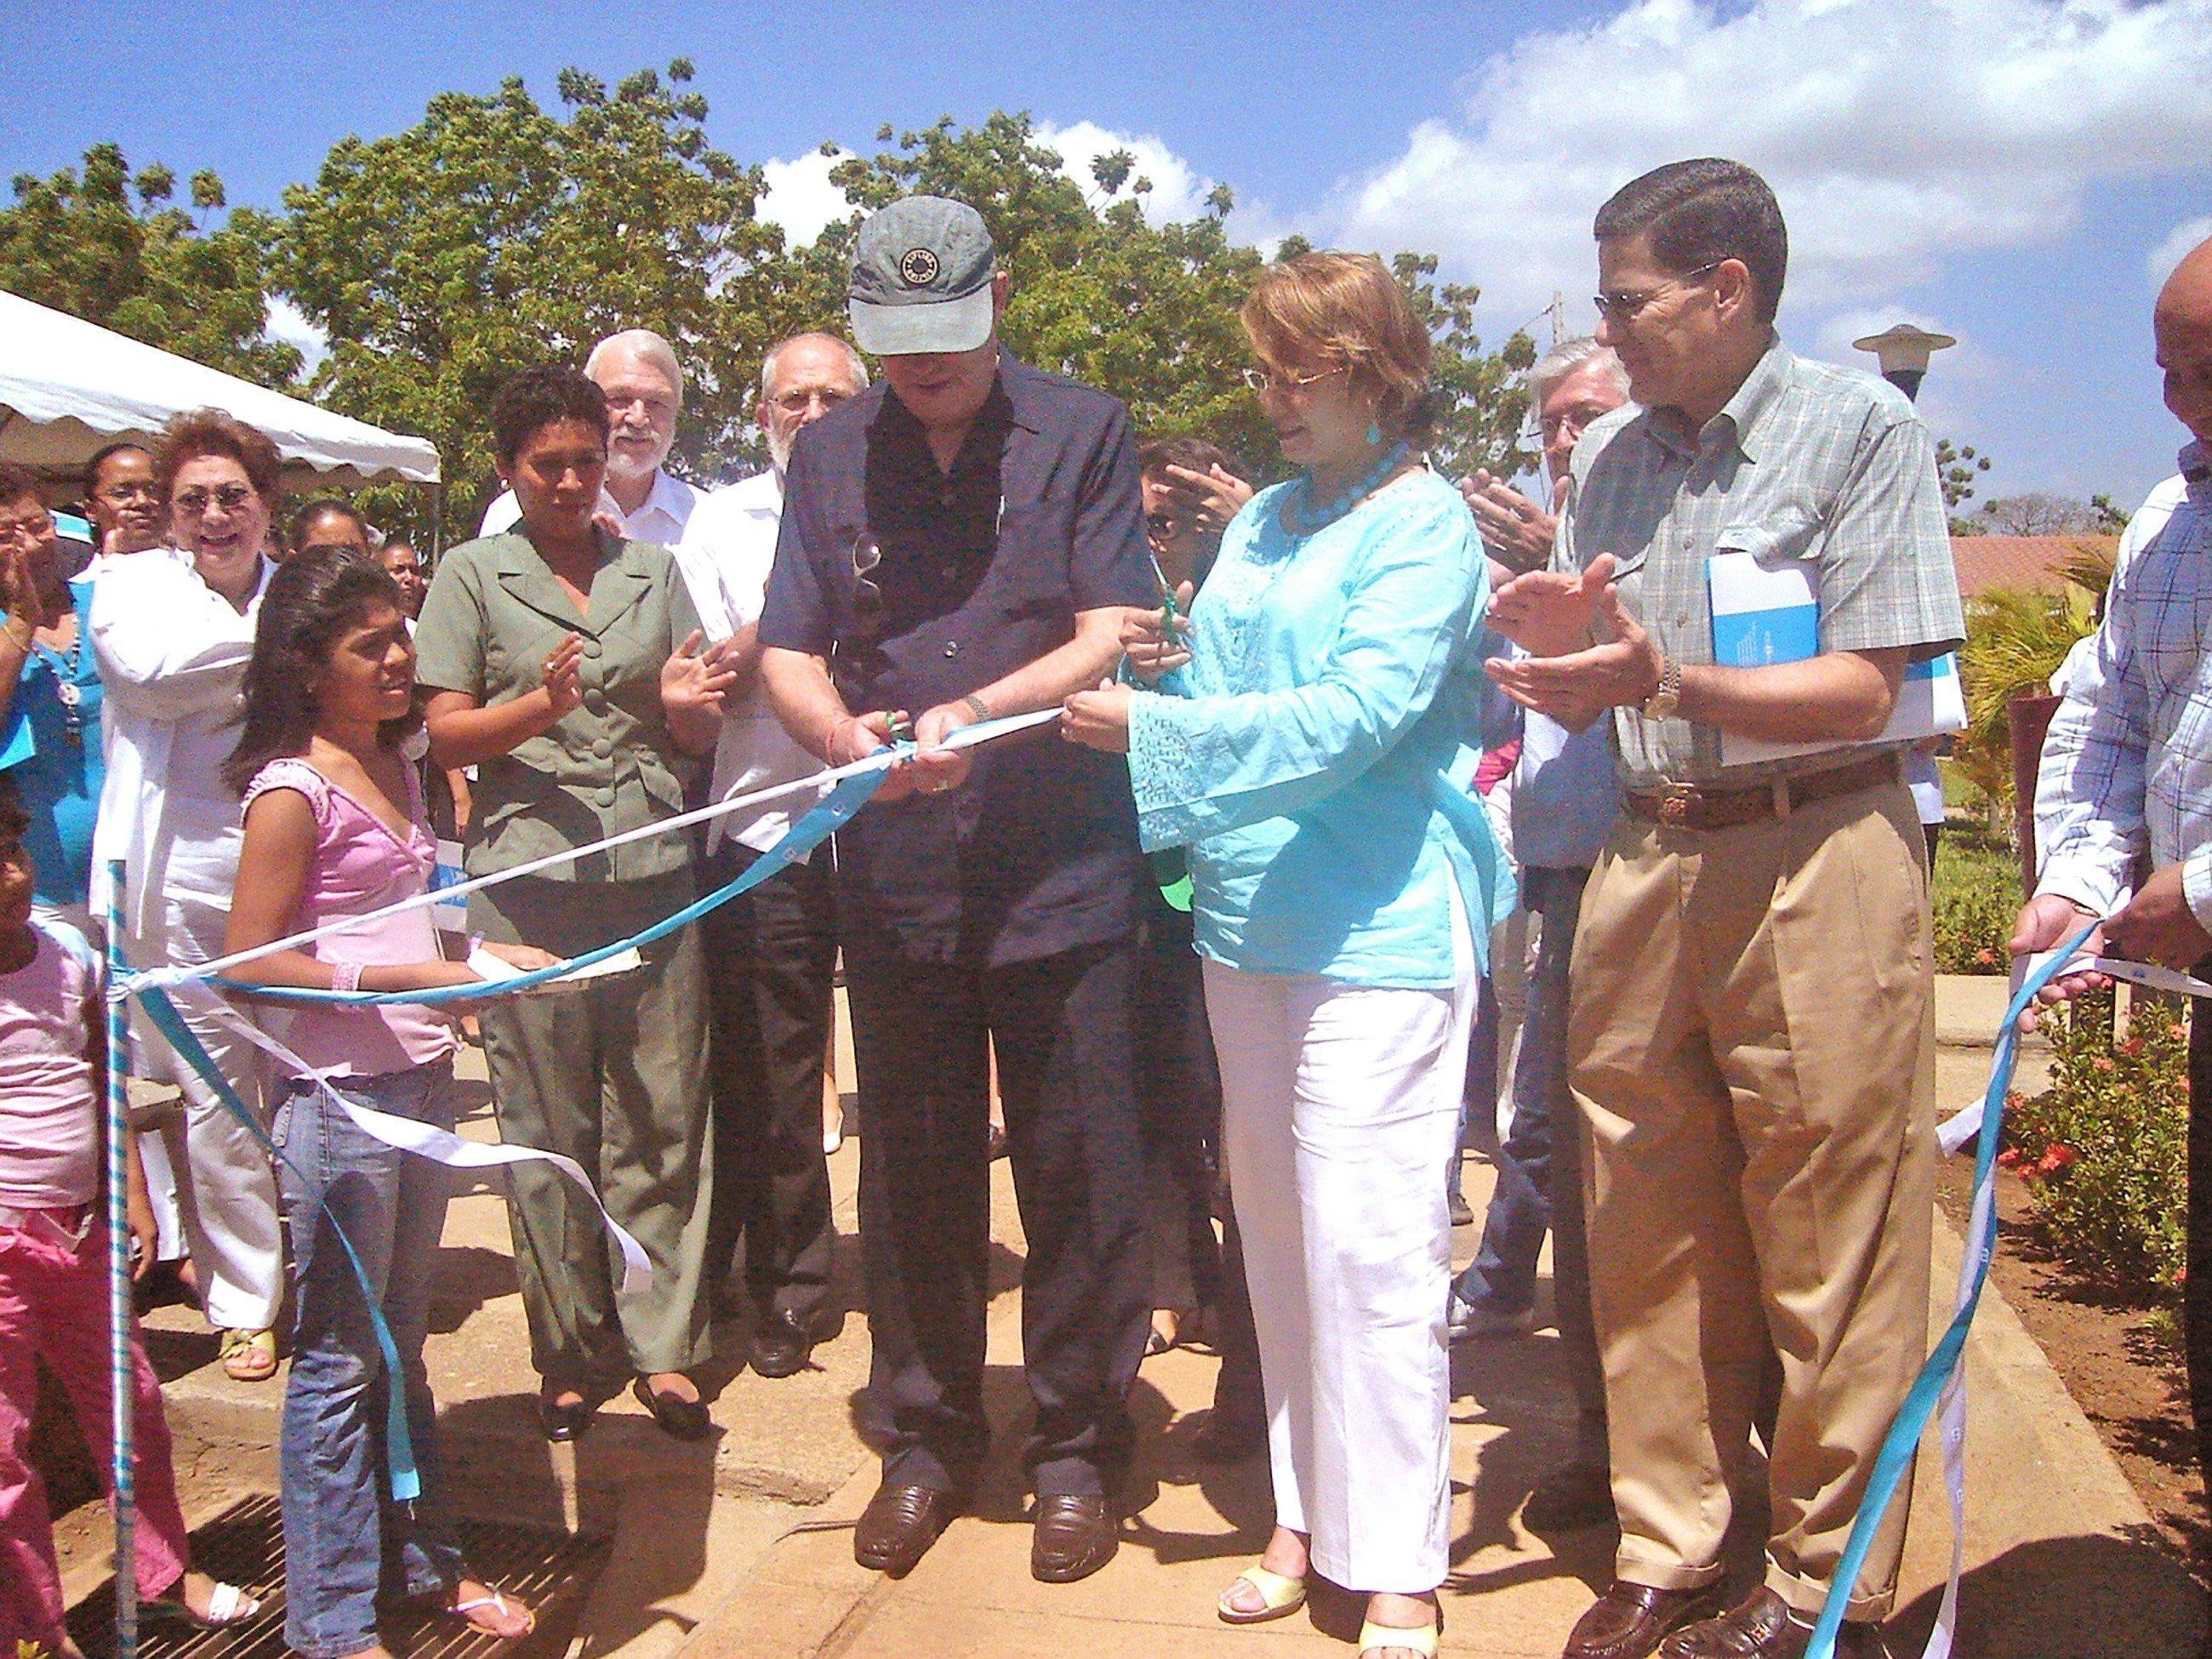 Des membres de SOS Villages d'Enfants en train de couper un ruban.